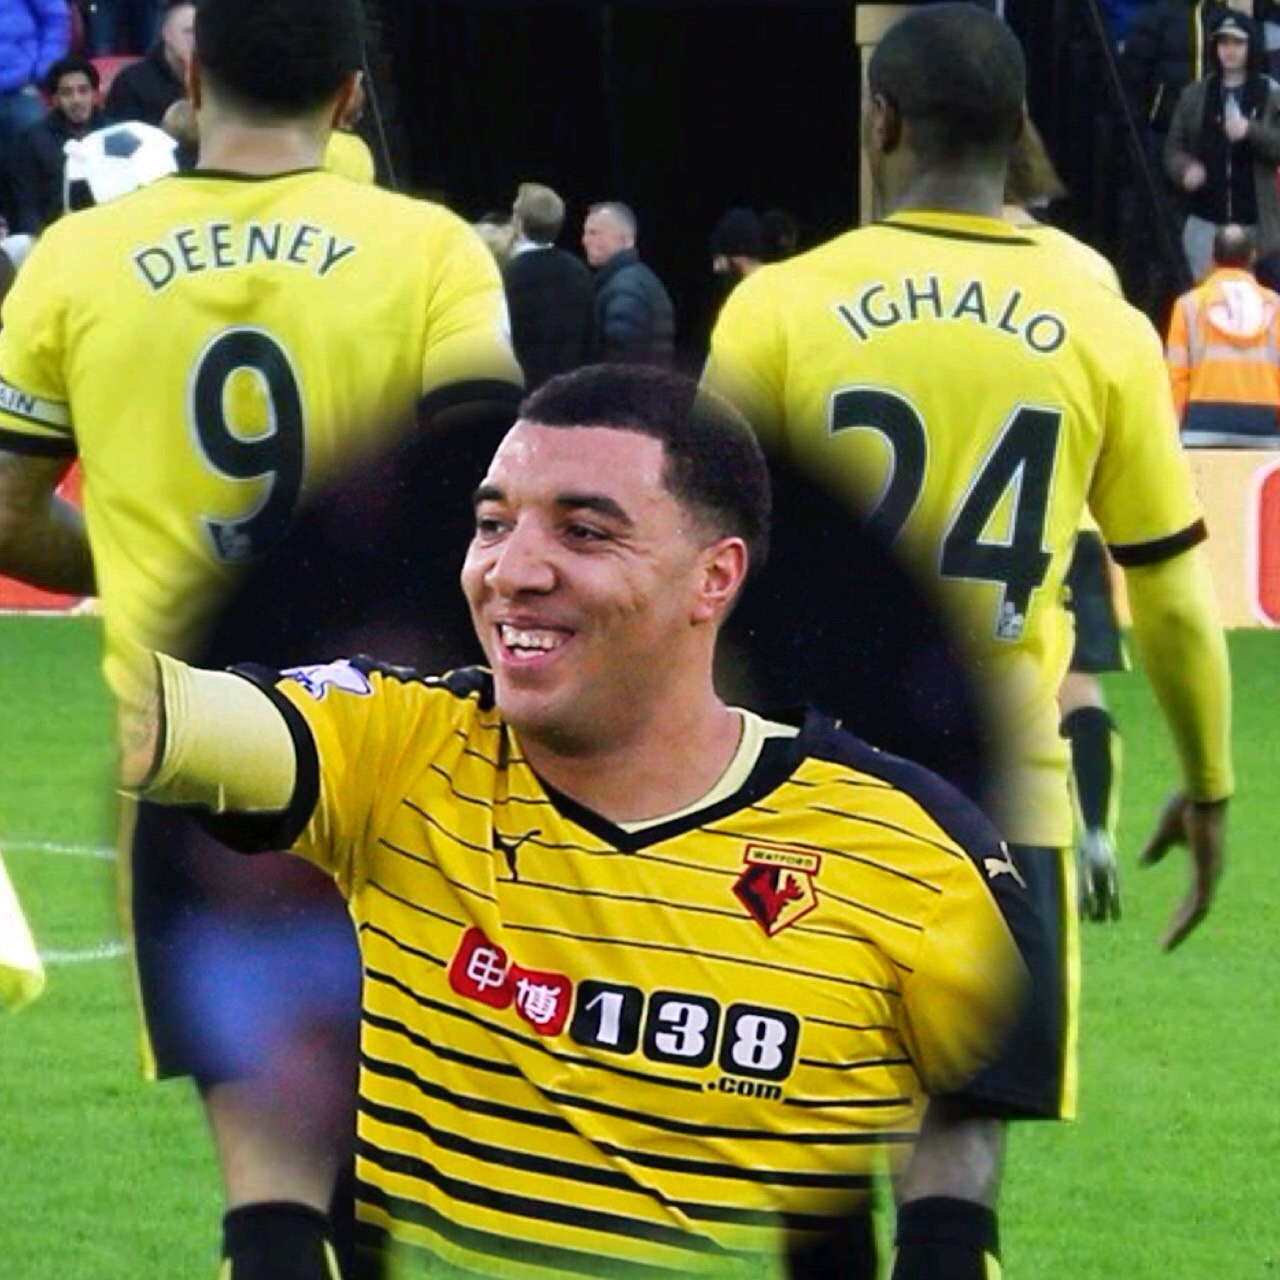 Ighalo Strike Partner, Deeney Signs New 5-Year Watford Deal